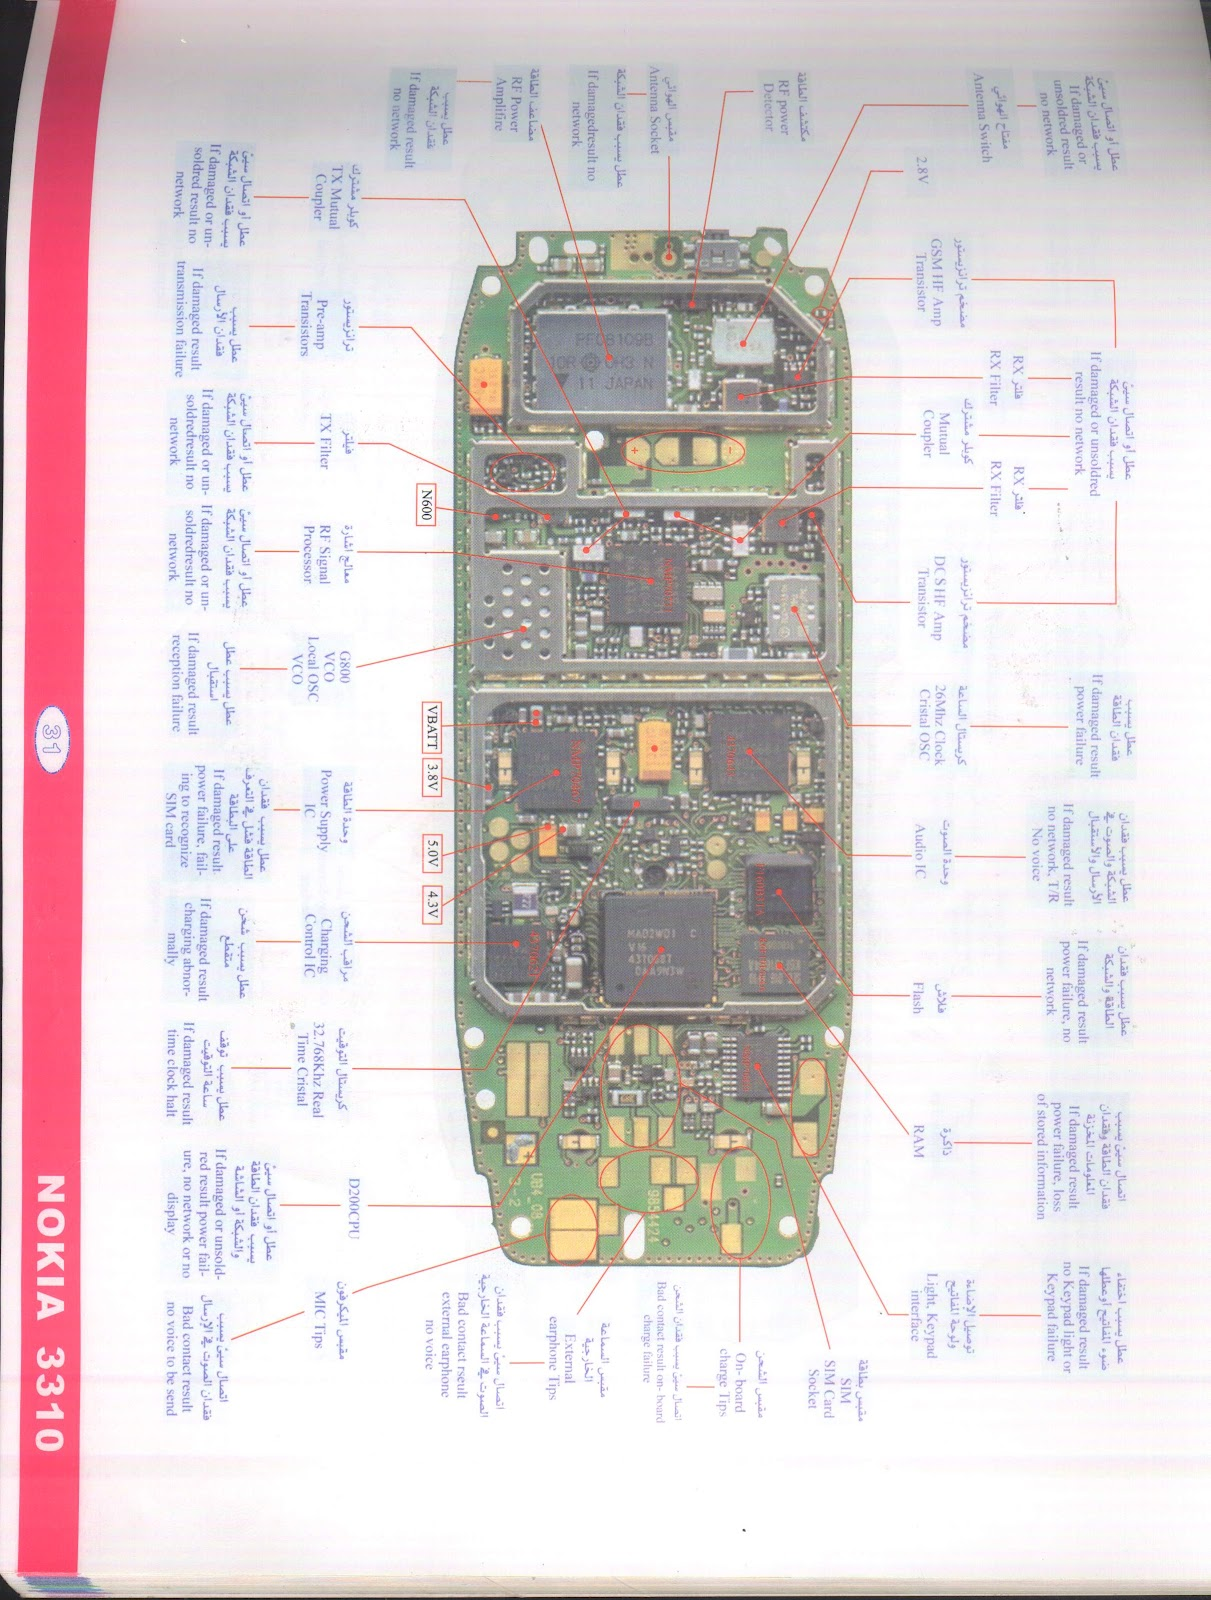 nokia 3210 circuit board details [ 1211 x 1600 Pixel ]